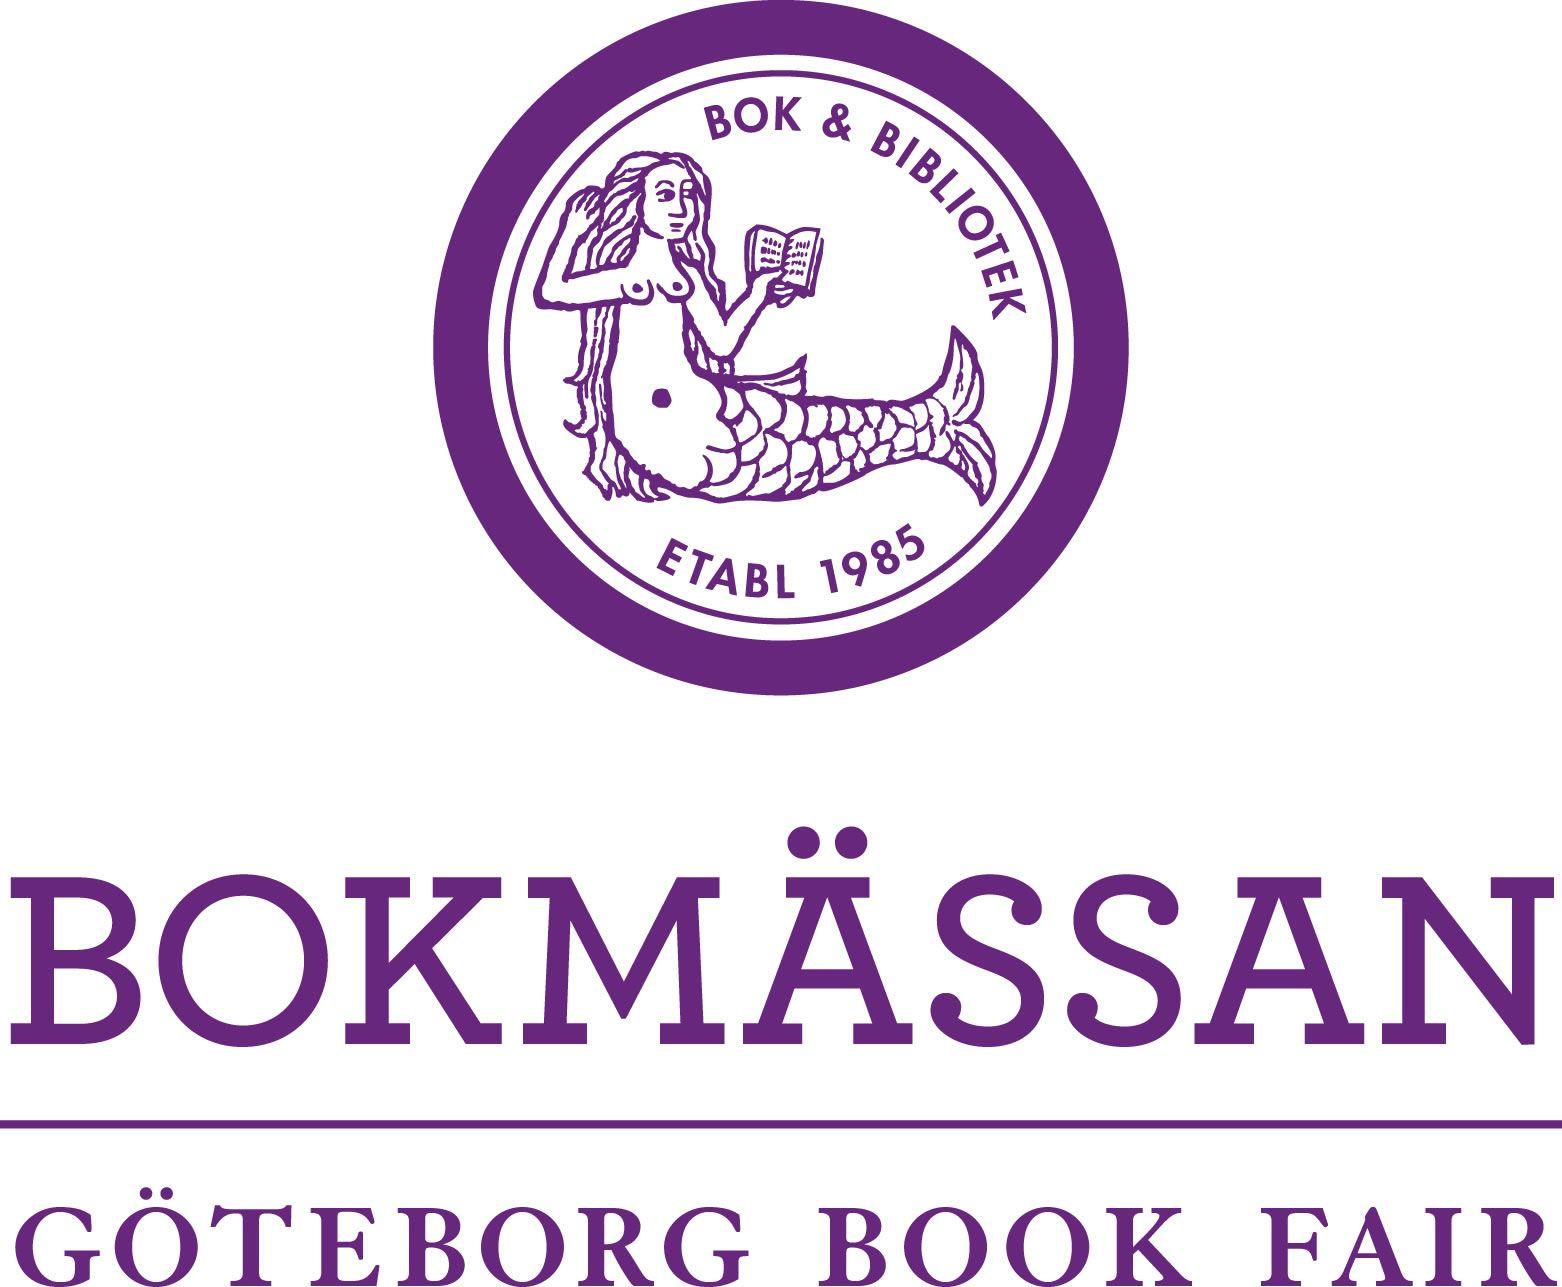 Bokmässans logo